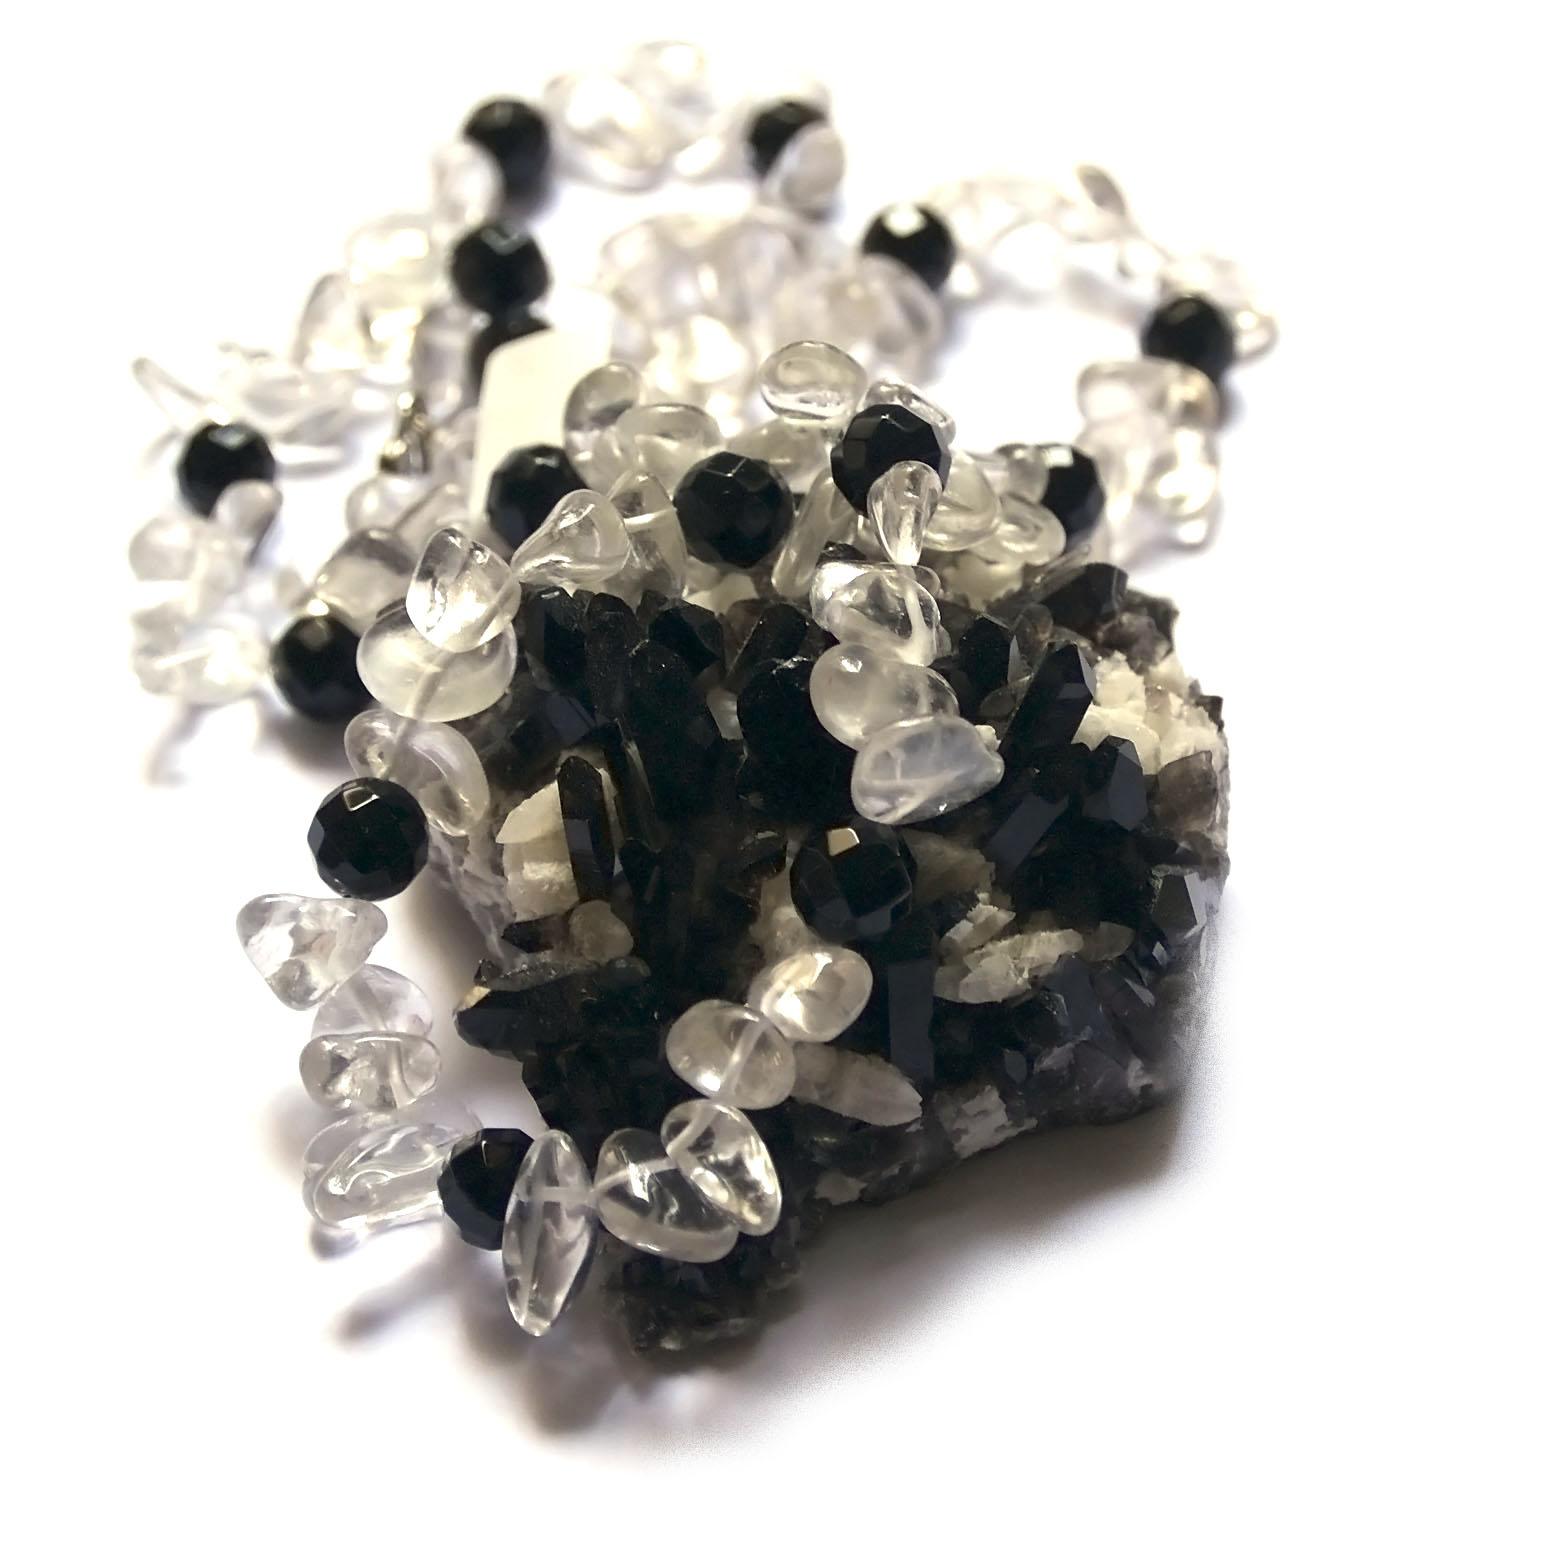 collier long onyx - quartz , Ts baroque - ronde 10 mm